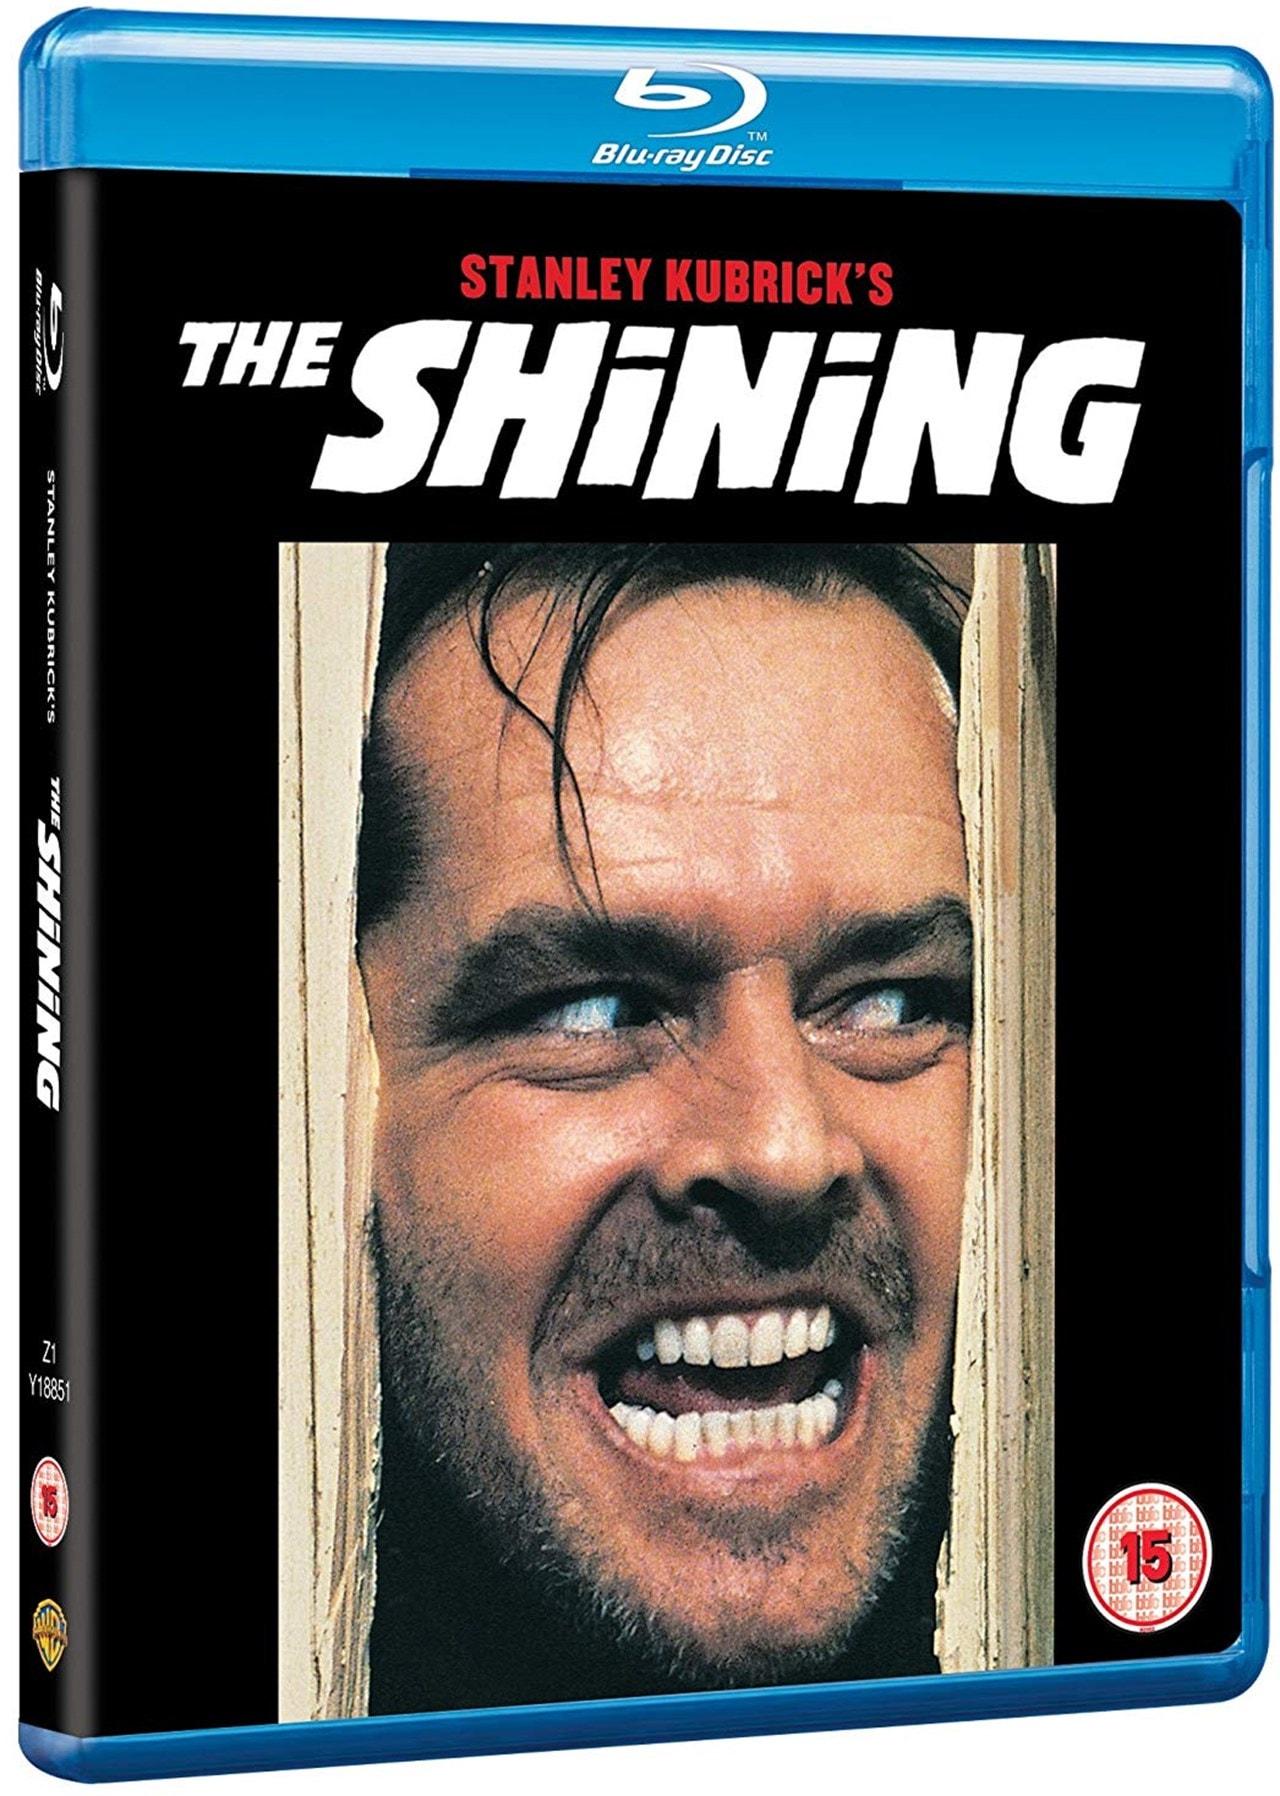 The Shining - 4